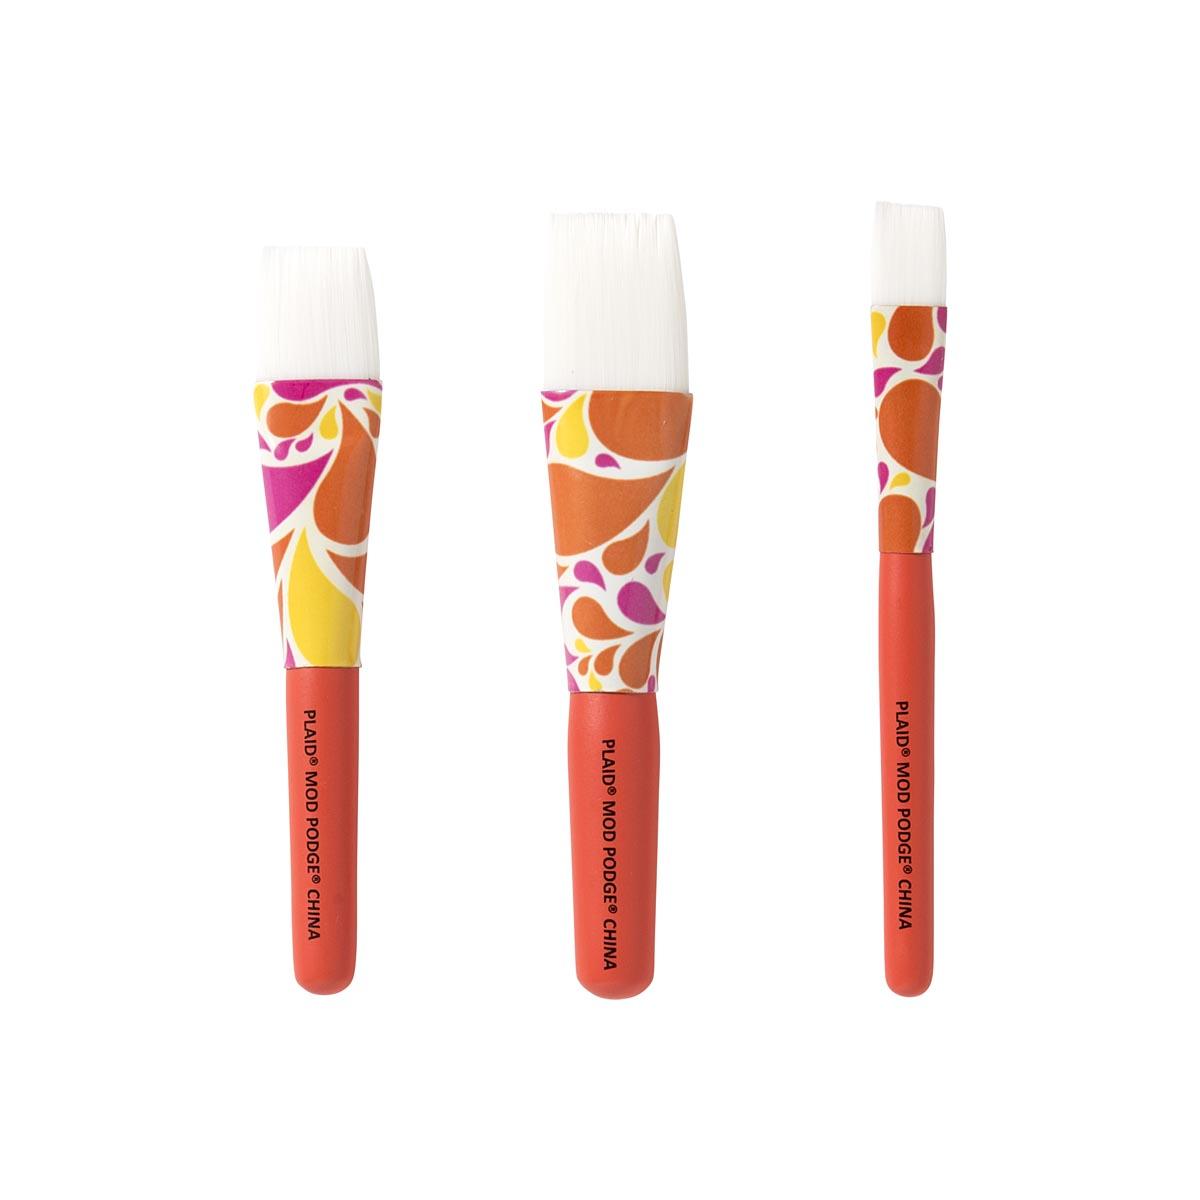 Mod Podge ® 3-piece Decoupage Brush Set